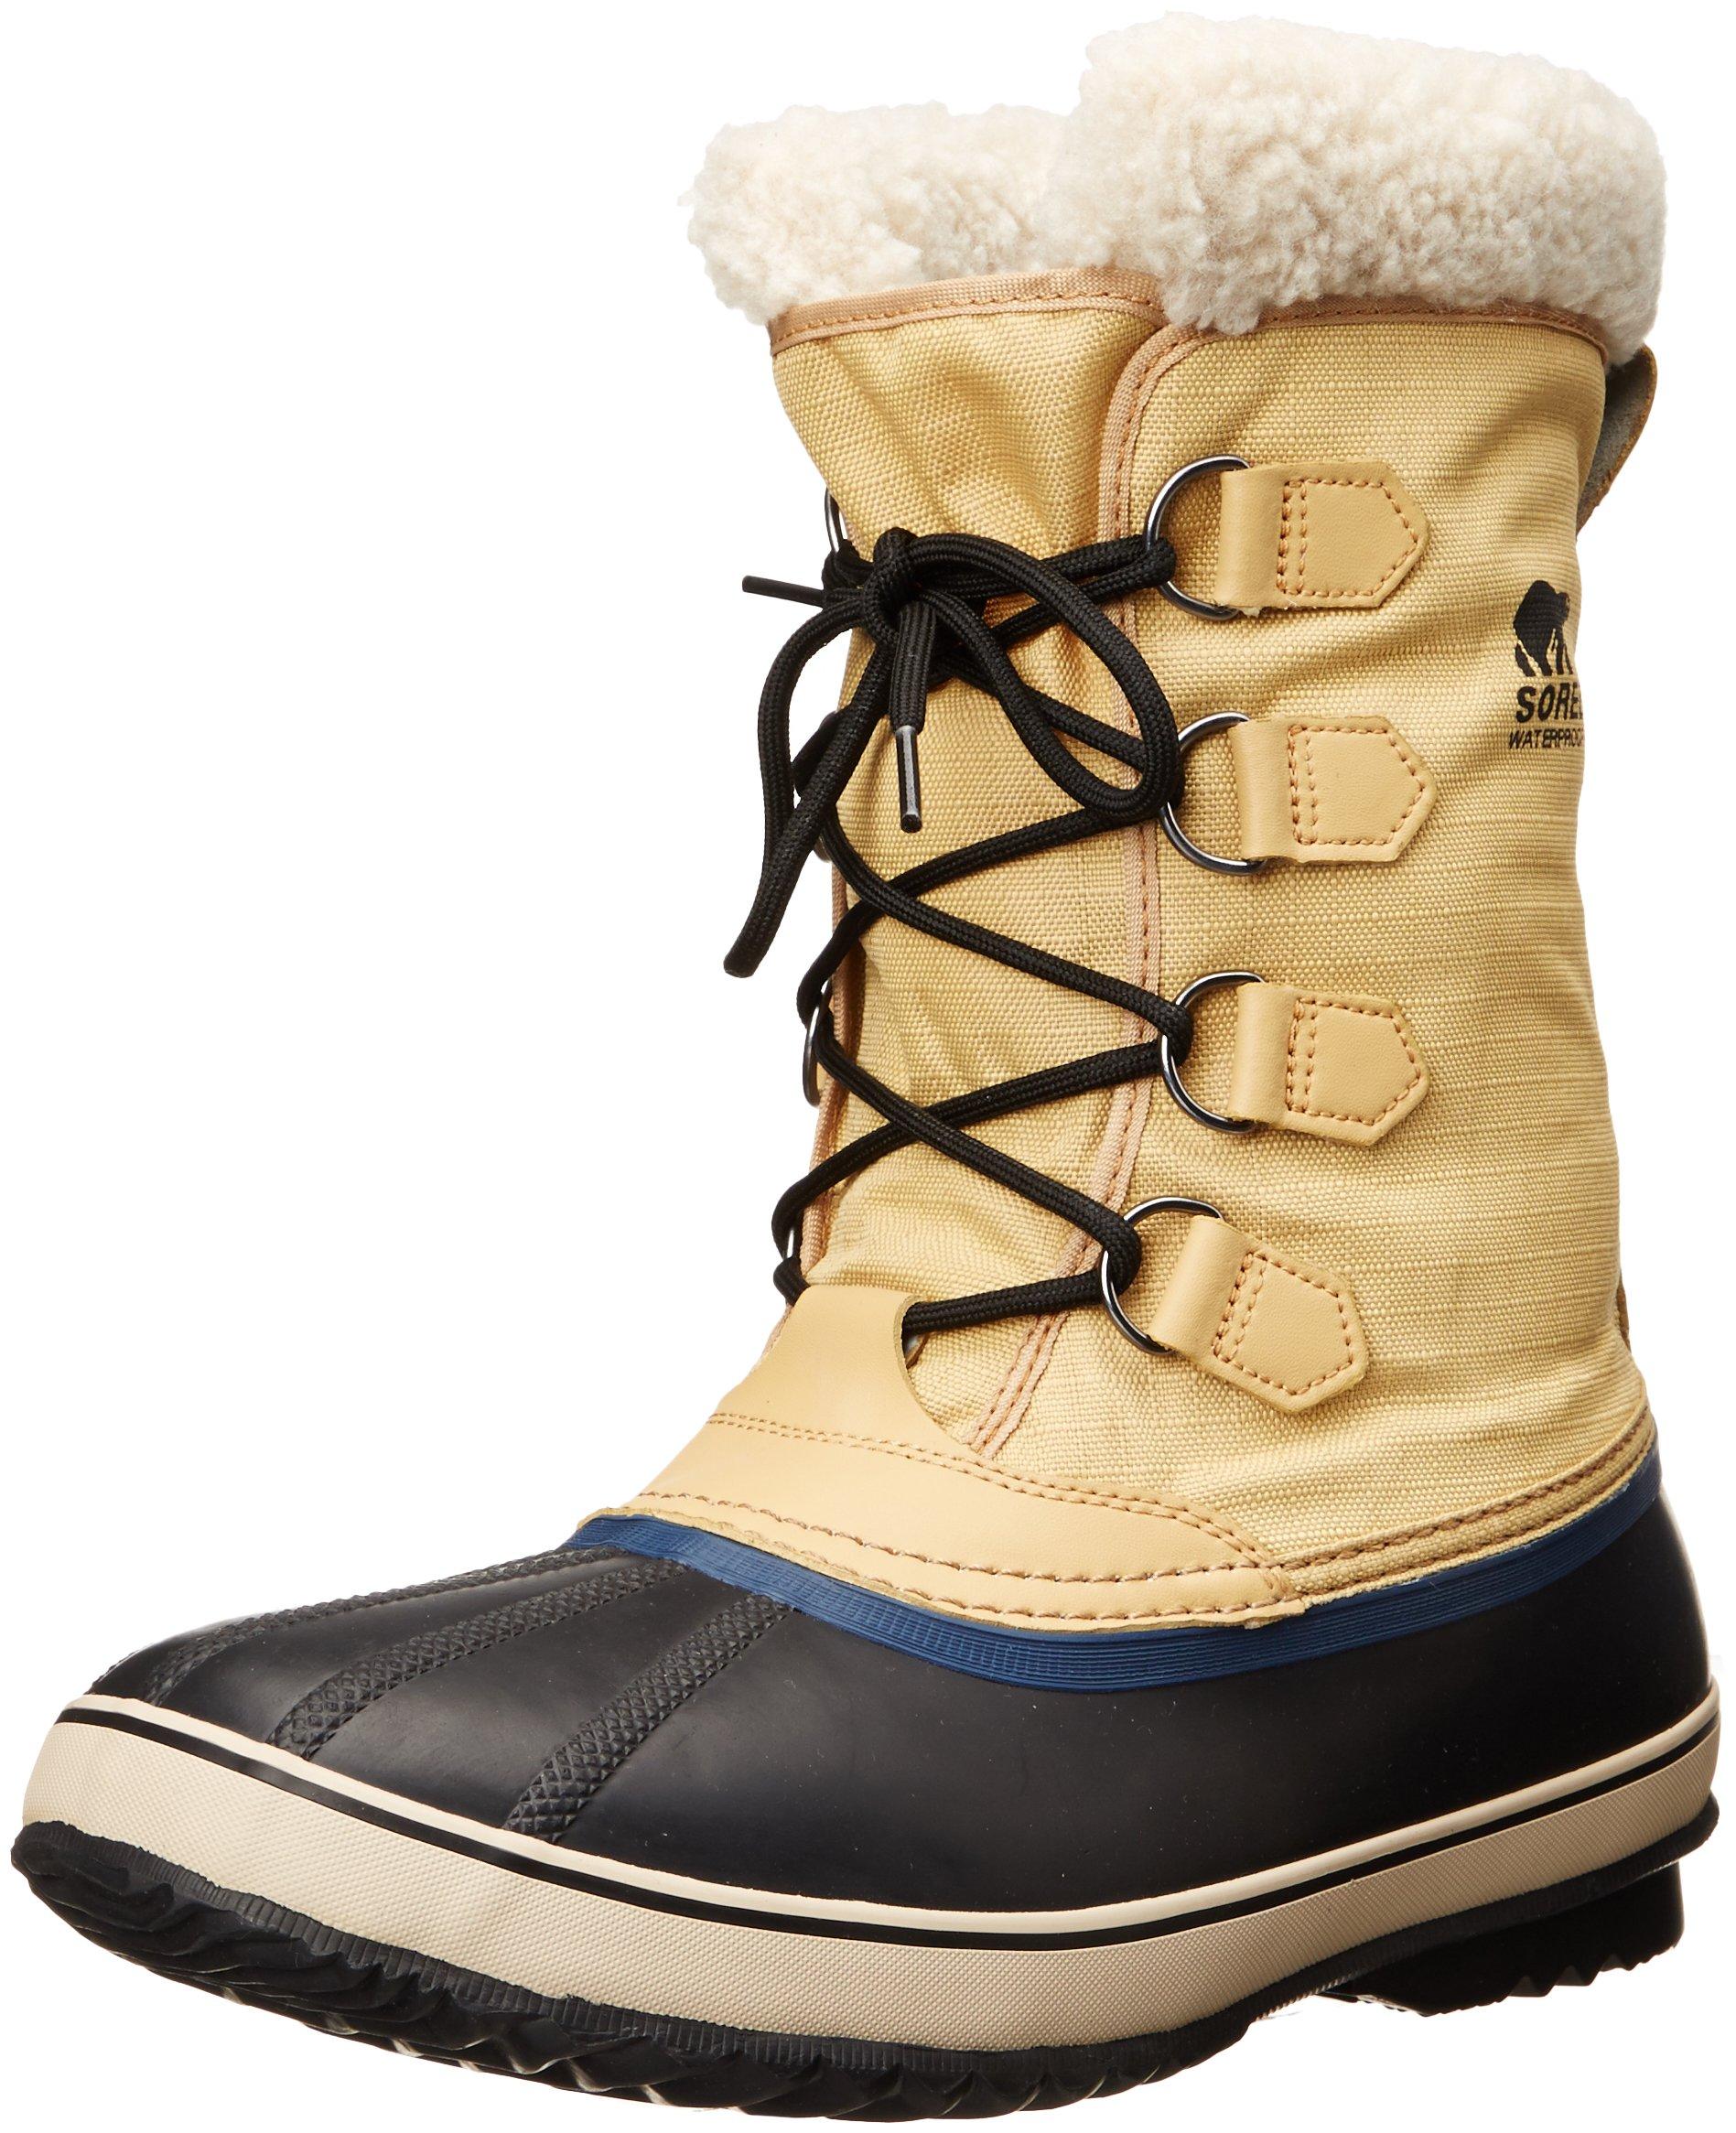 dbfe4d237c7 Sorel Men's 1964 Pac Nylon Snow Boot   Jodyshop